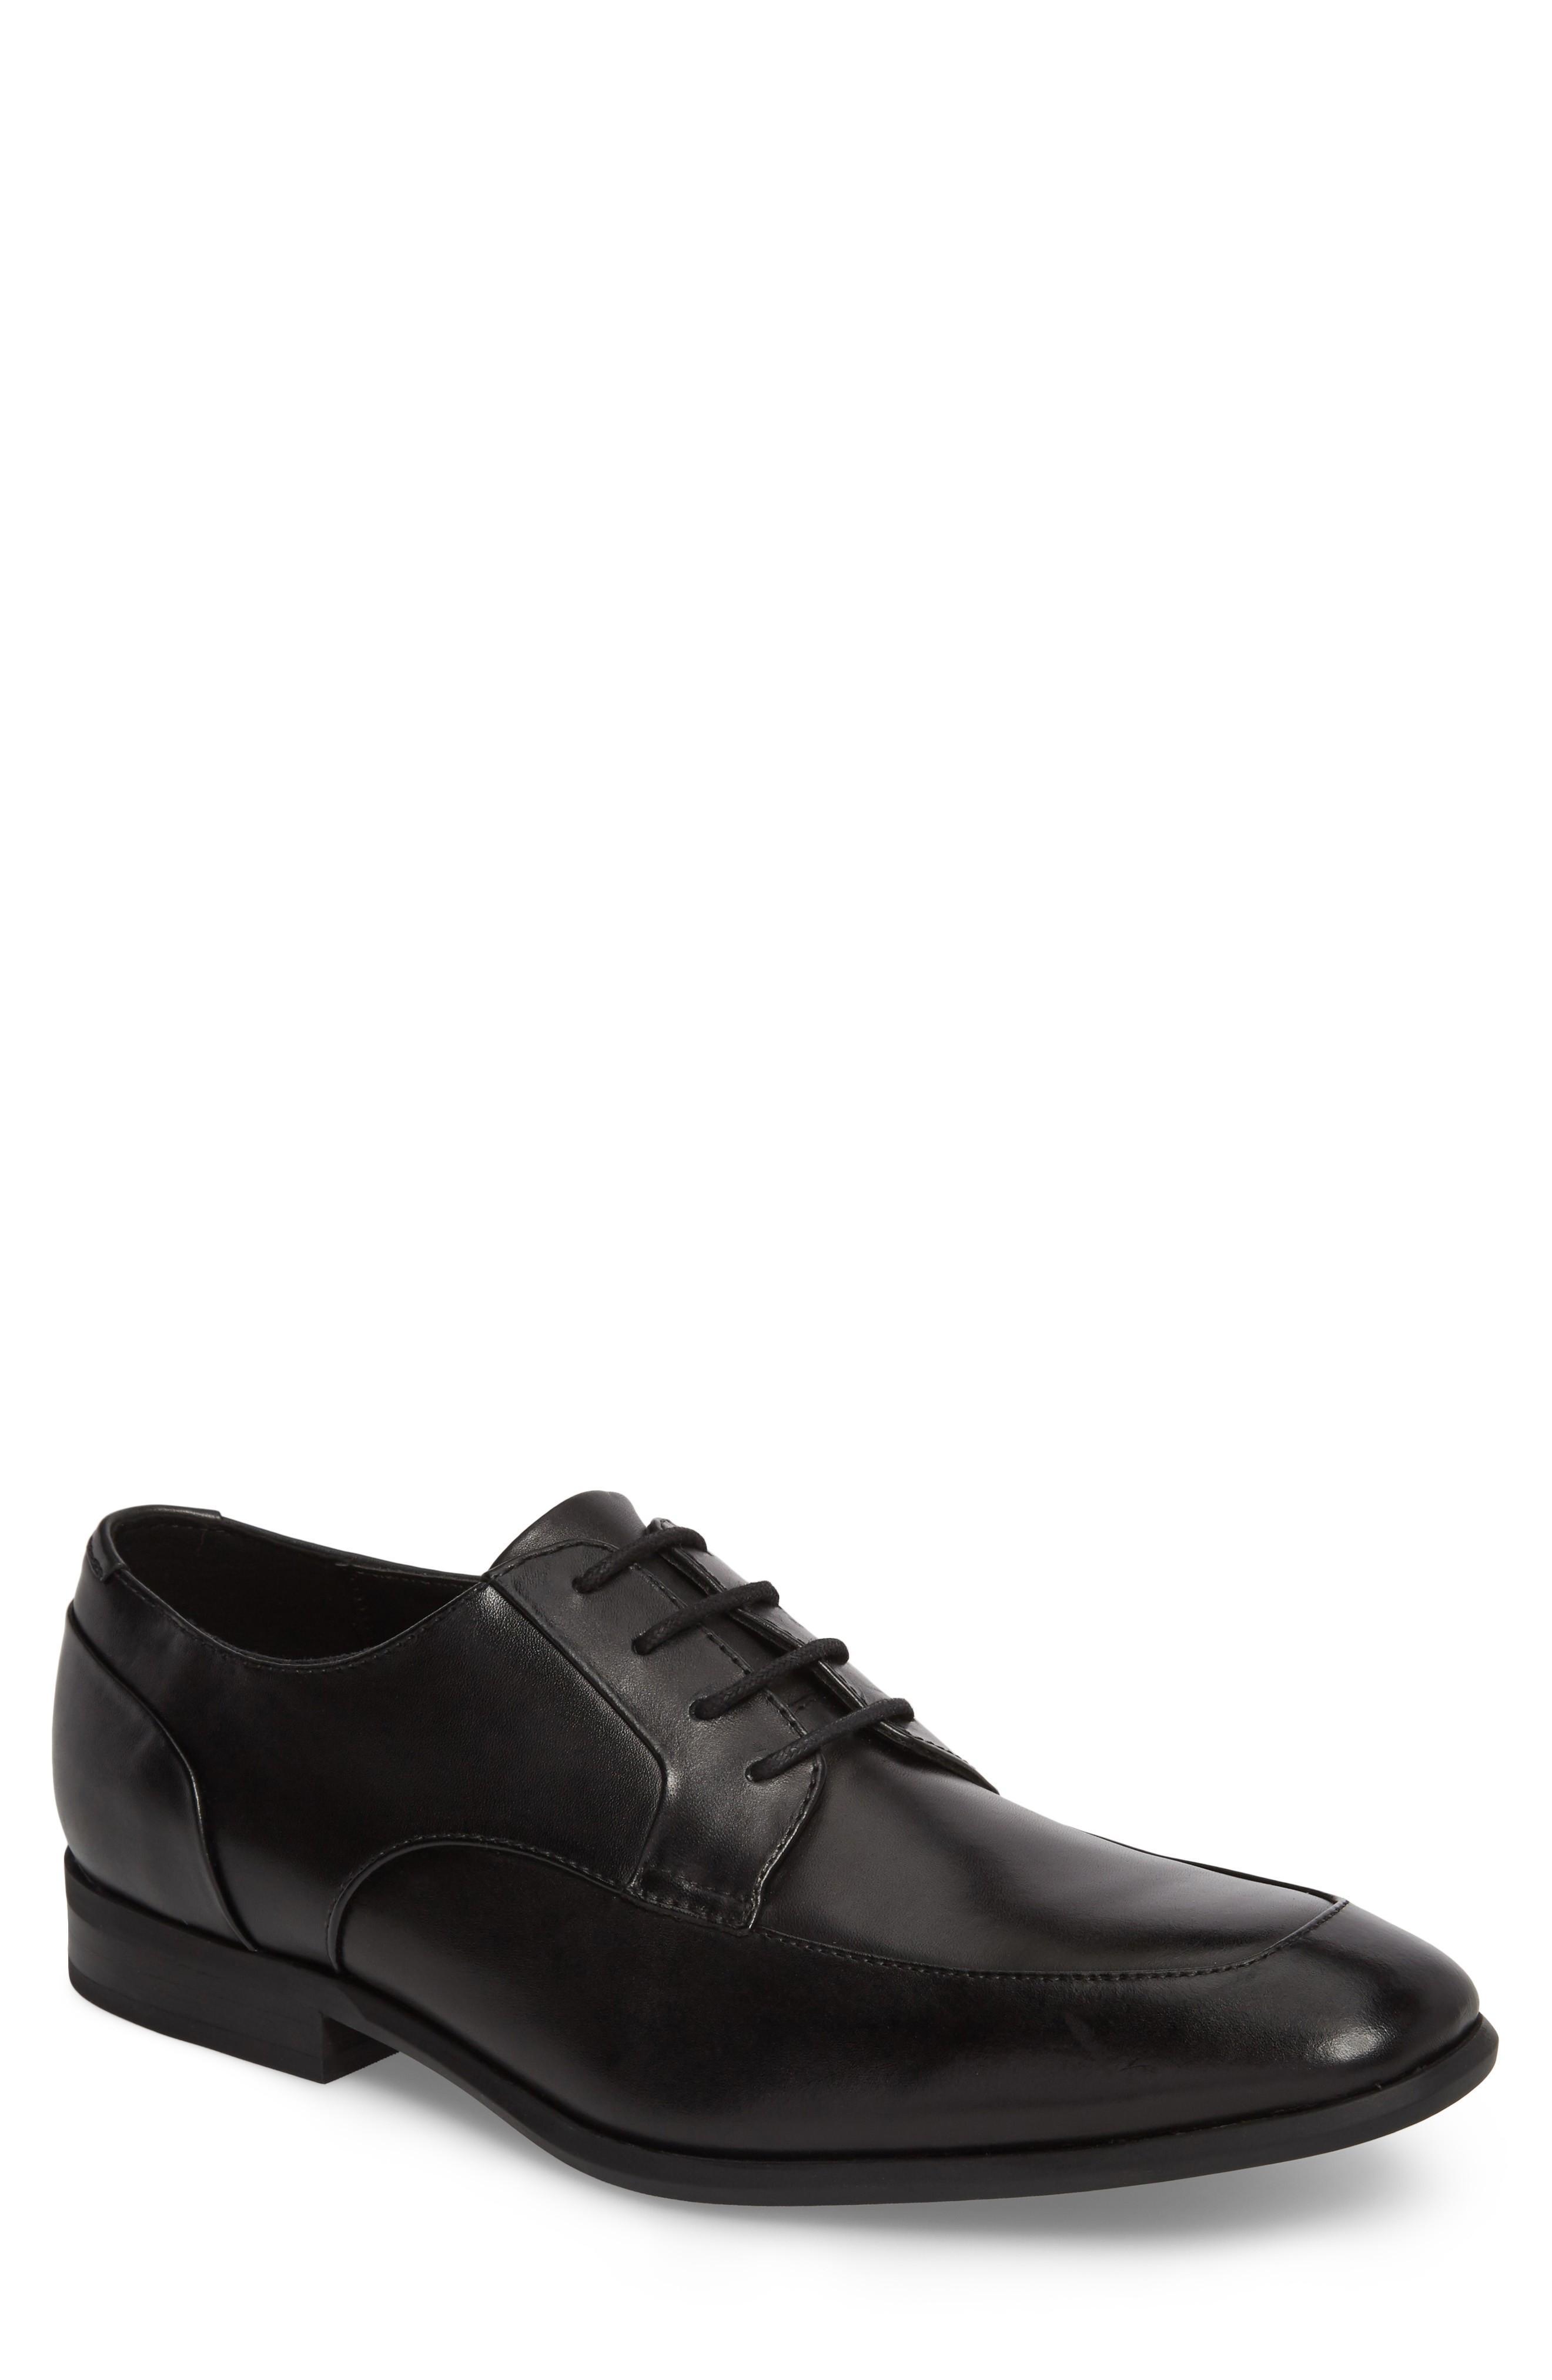 Calvin Klein Lazarus Apron Toe Derby In Black Leather